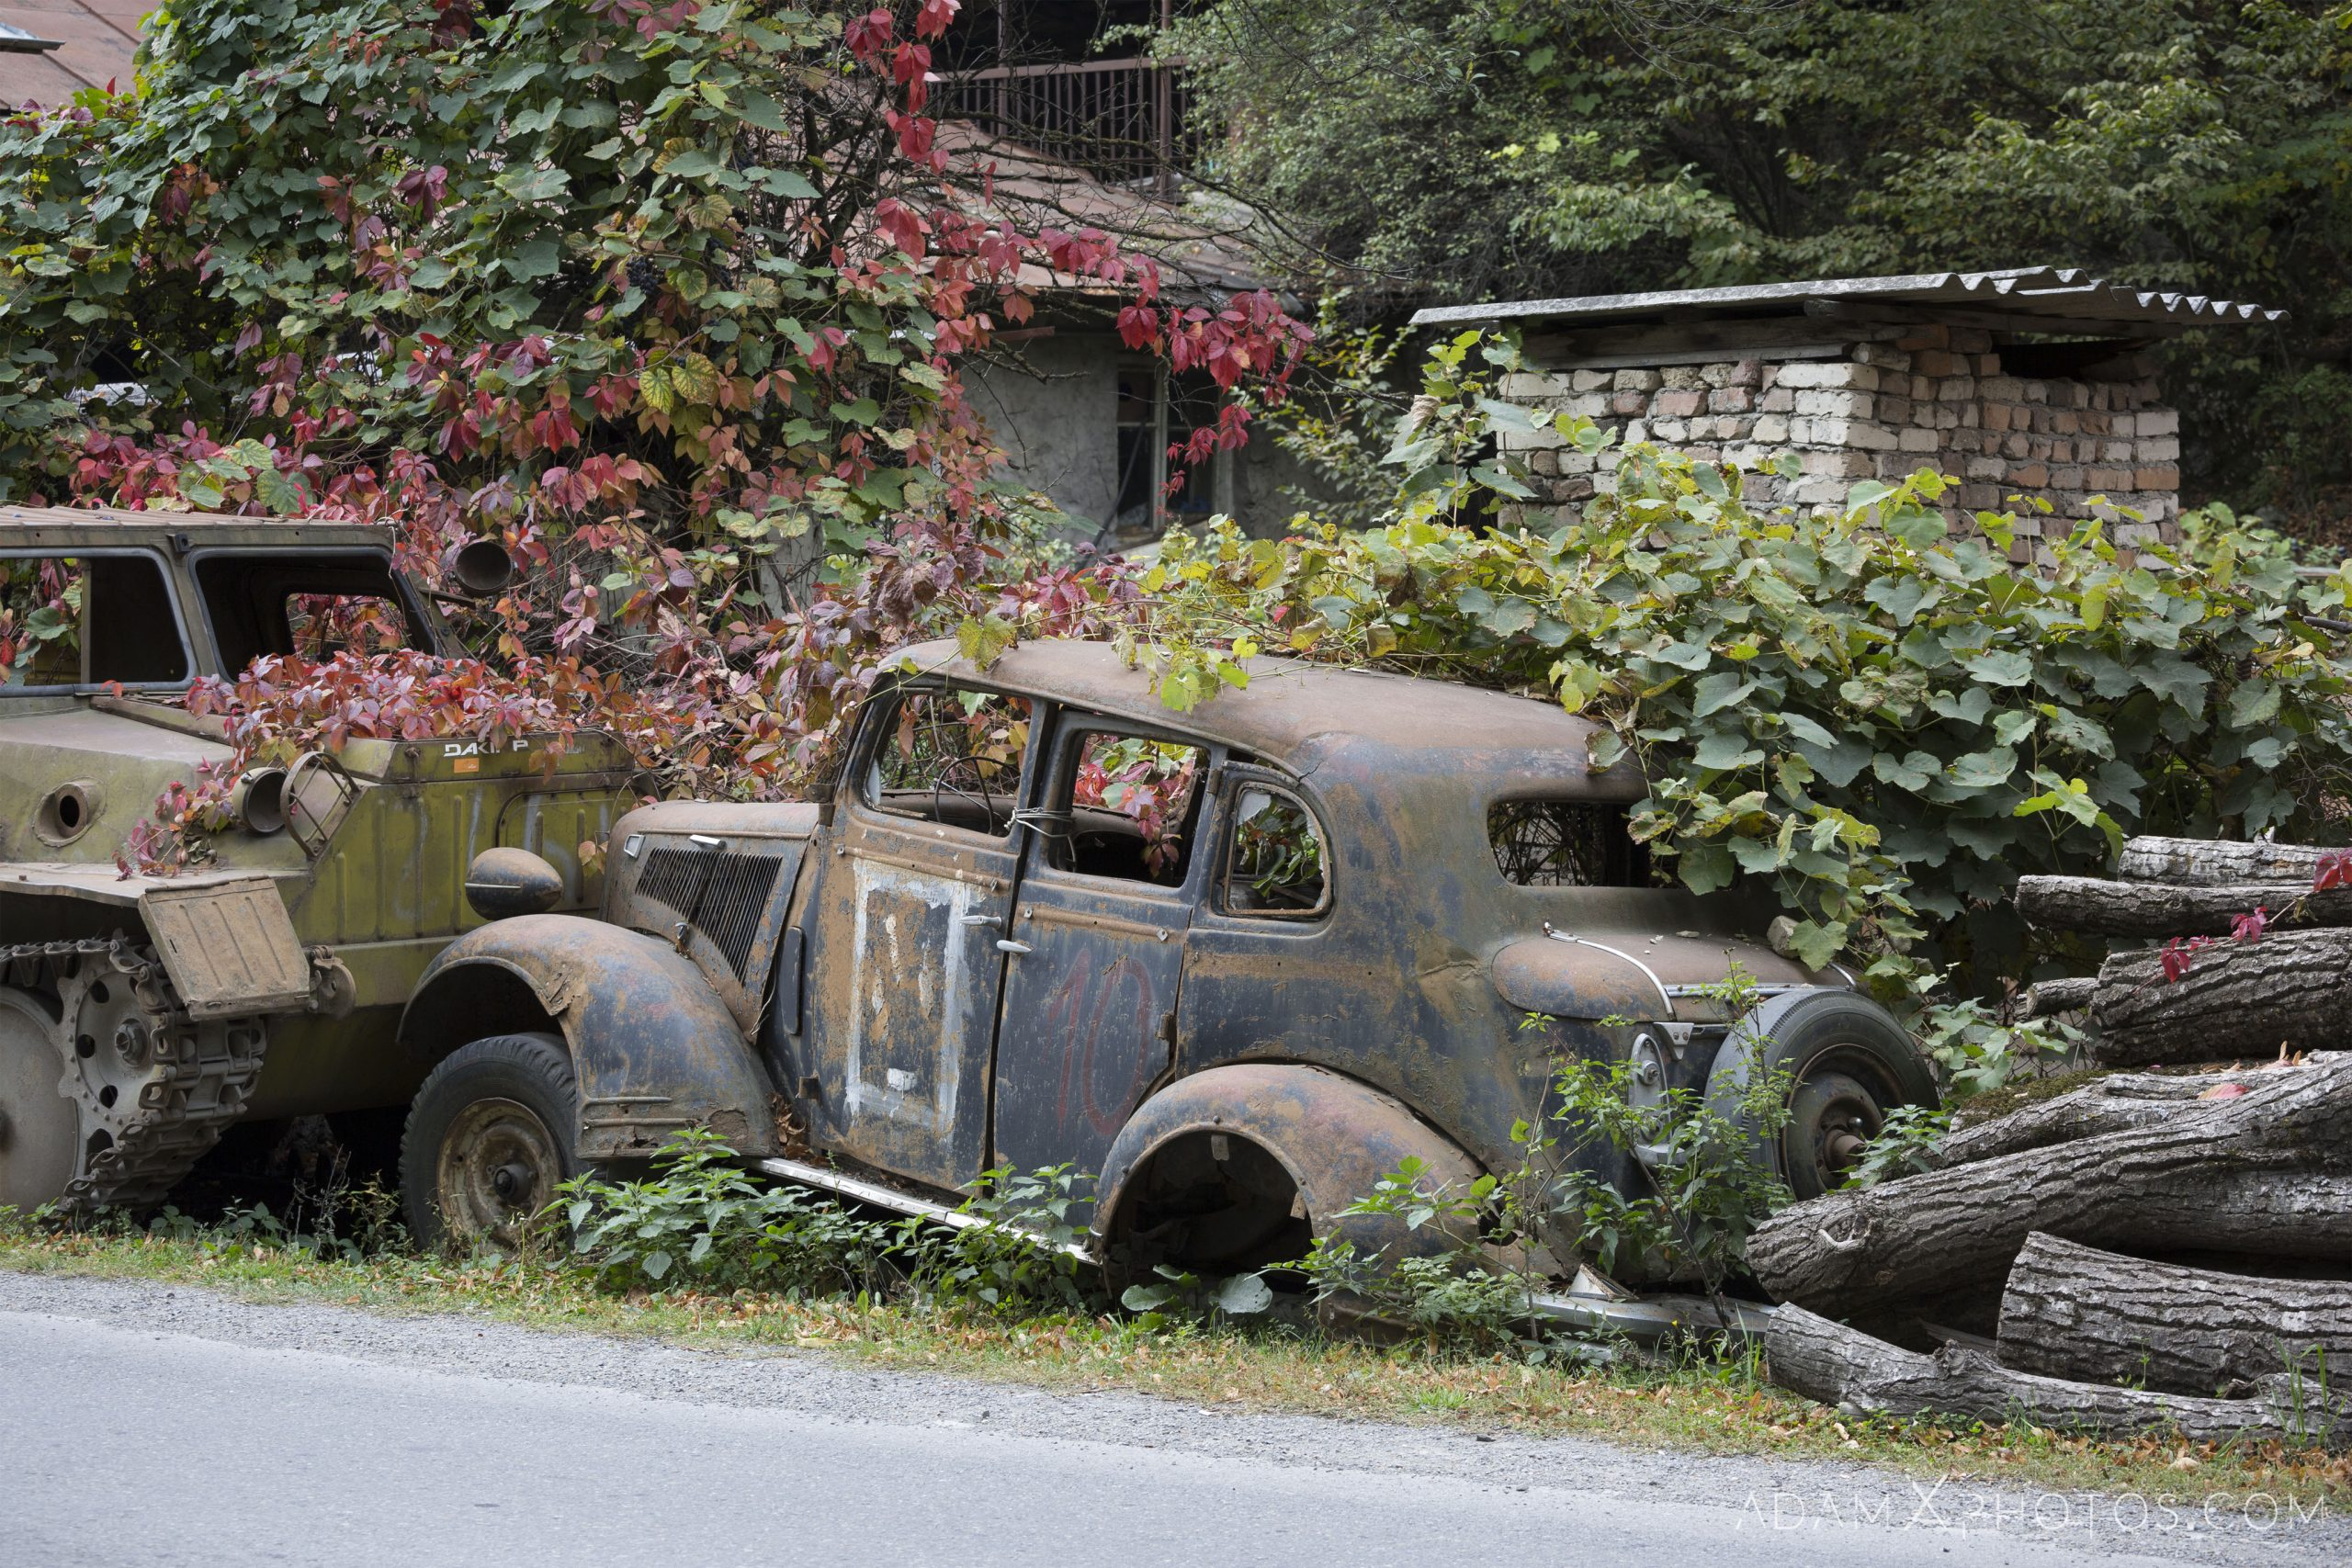 Old car ivy overgrown Car Vehicle Vehicles Graveyard rusting road trip Georgia Adam X AdamXPhotos Urbex Urban Exploration 2018 Abandoned ruins lost forgotten derelict location